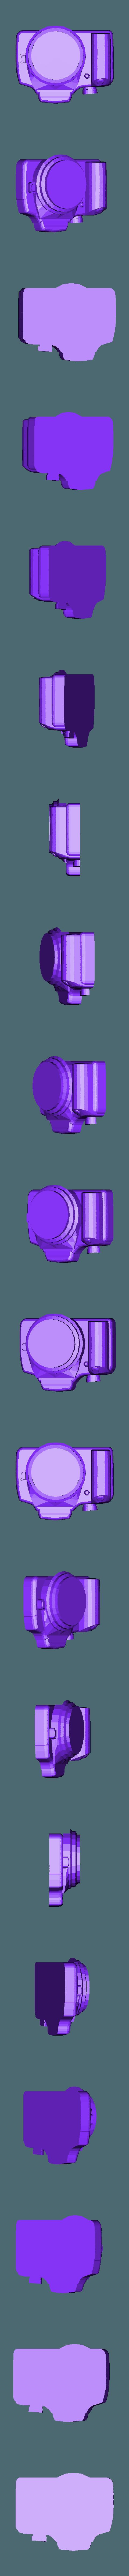 2_body_fixed.stl Download free STL file Canon EOS 350D model • 3D printer template, Aralala